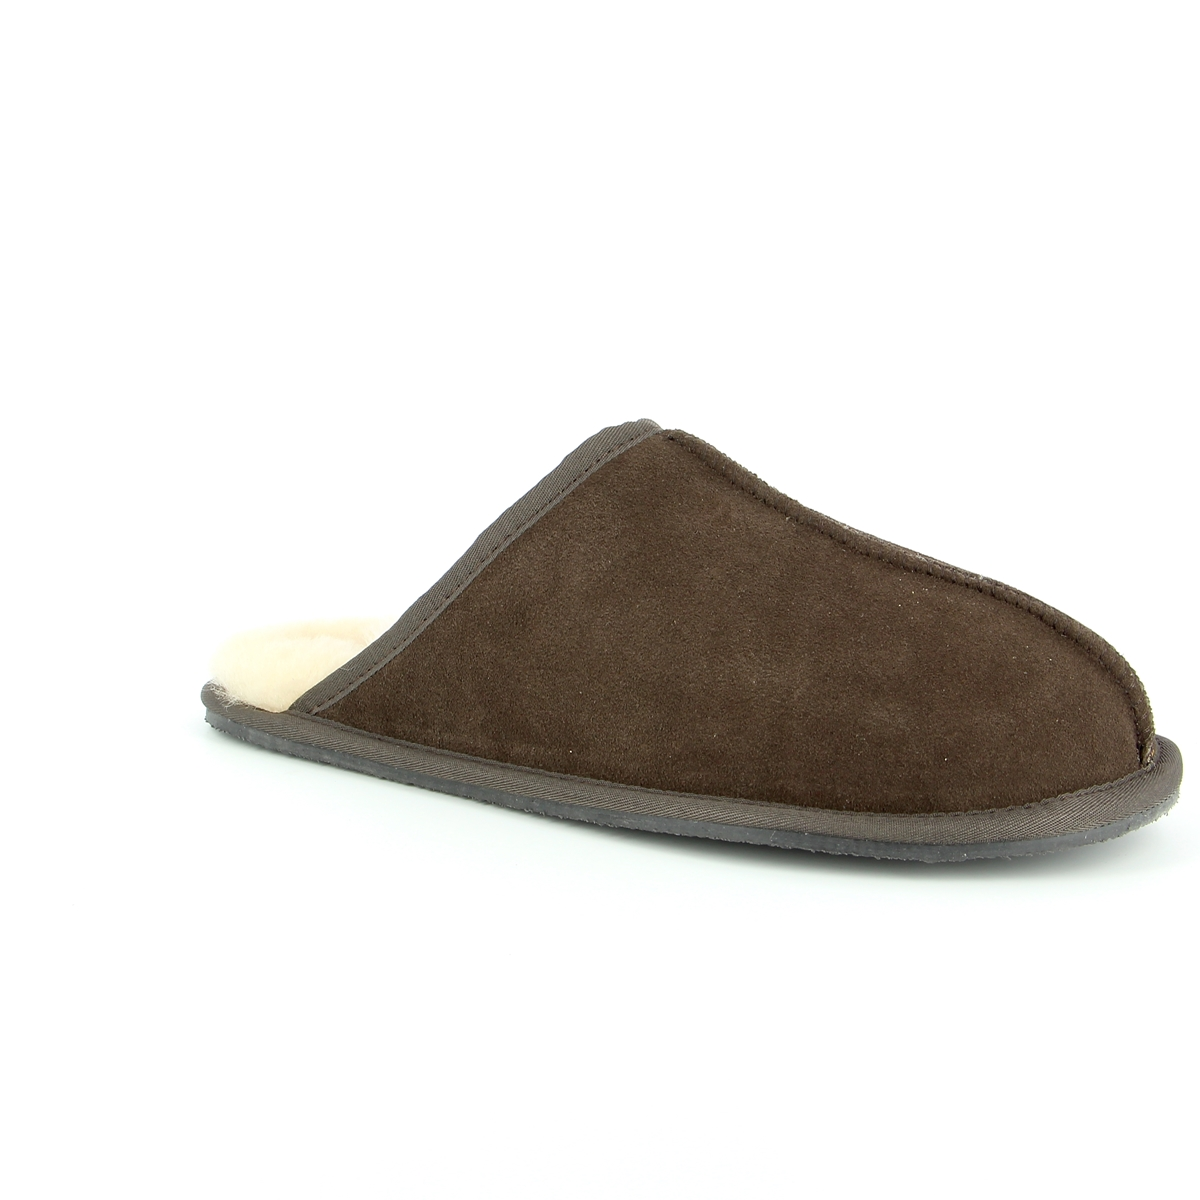 Cypres Pantoufles brun